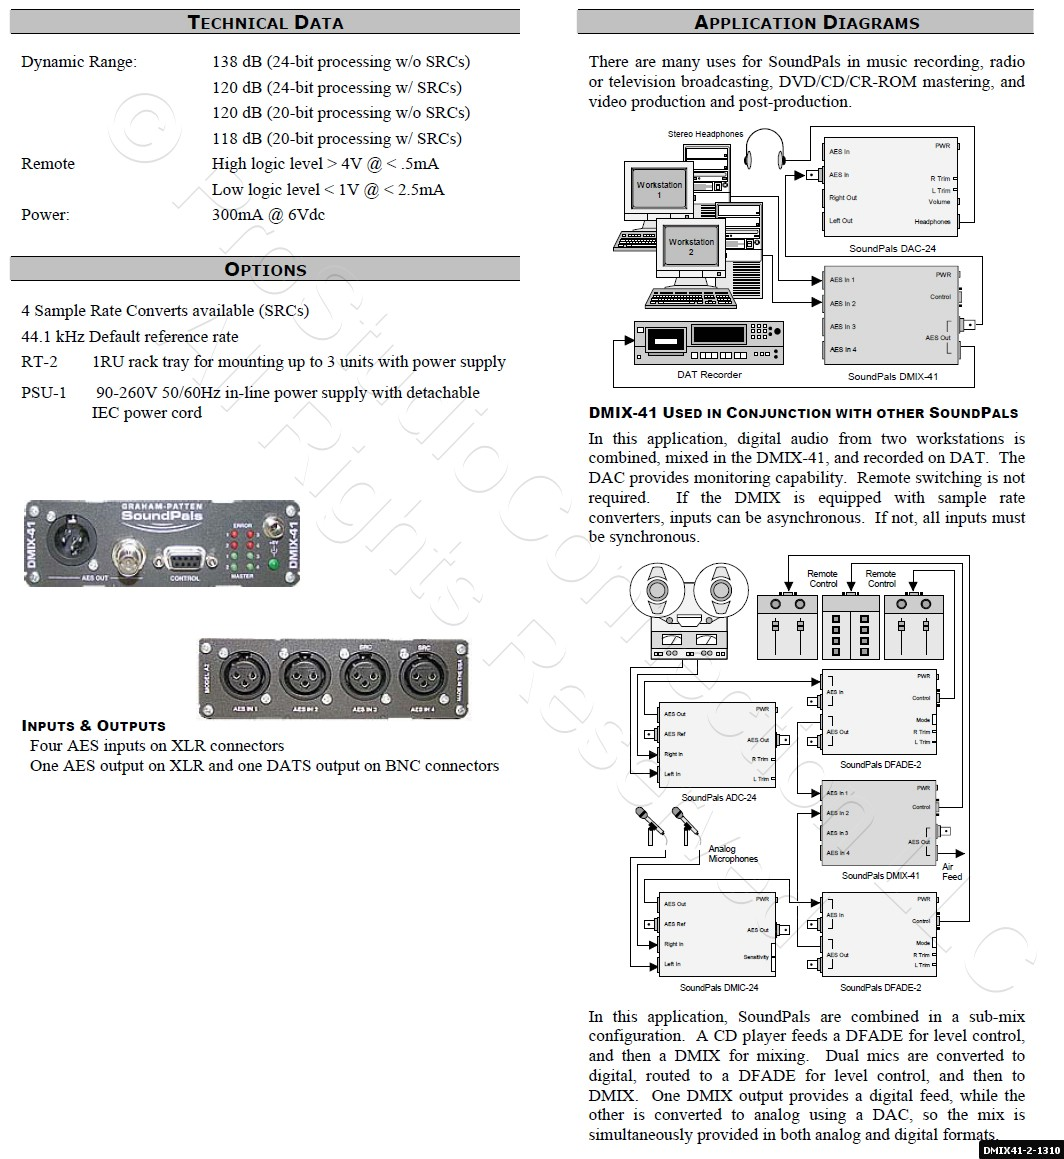 https://www.prostudioconnection.net/1310/DMIX41-2.jpg